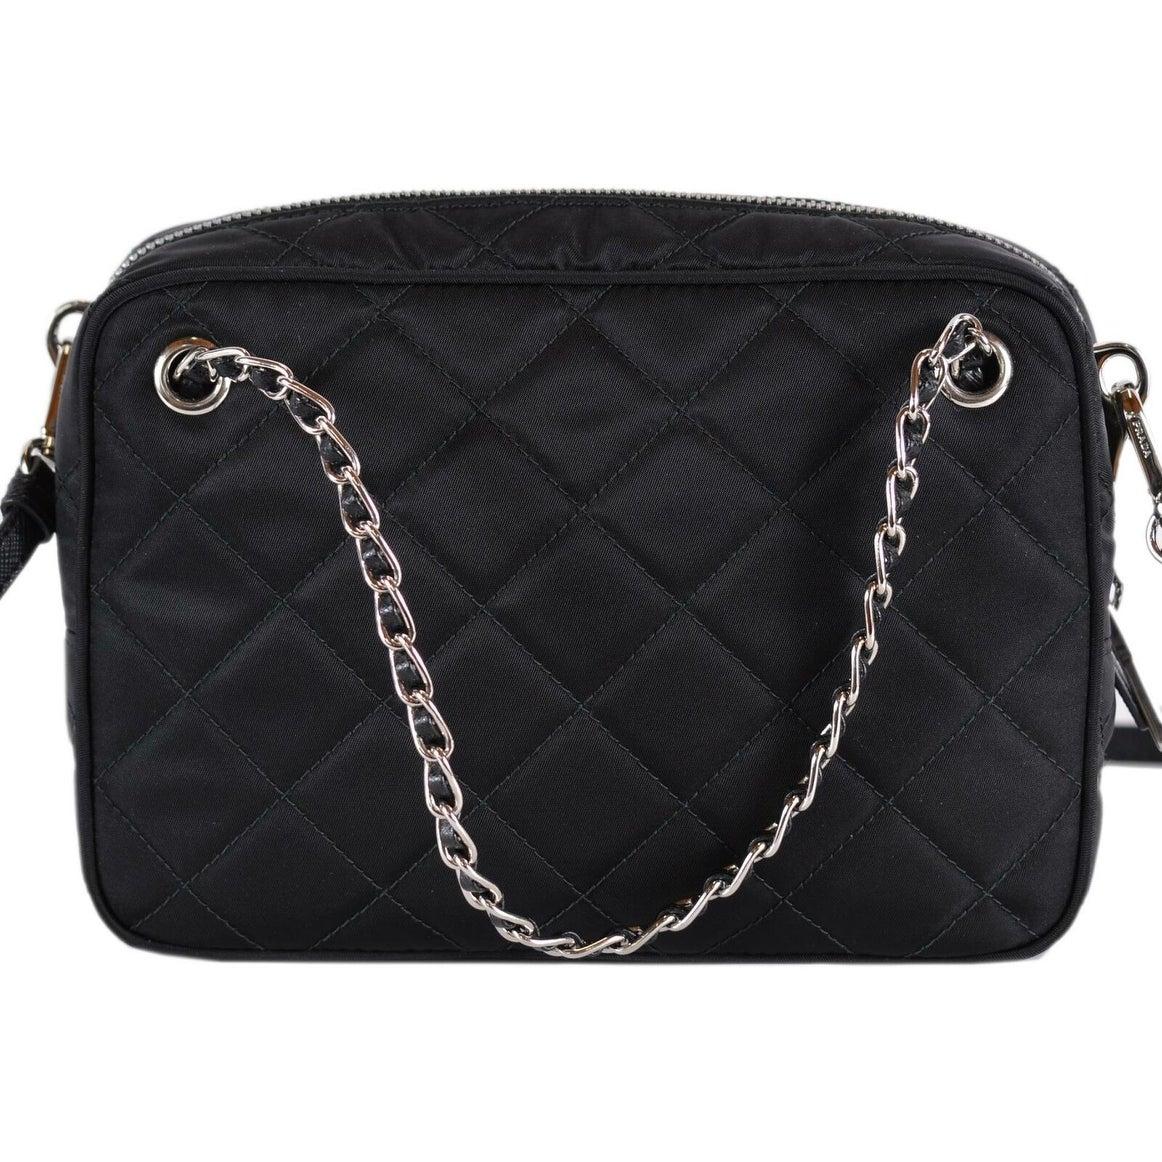 e80502a2d8b6 Shop Prada 1BH910 Black Quilted Tessuto Nylon Bandoliera Crossbody Purse  Handbag - On Sale - Free Shipping Today - Overstock - 27745488